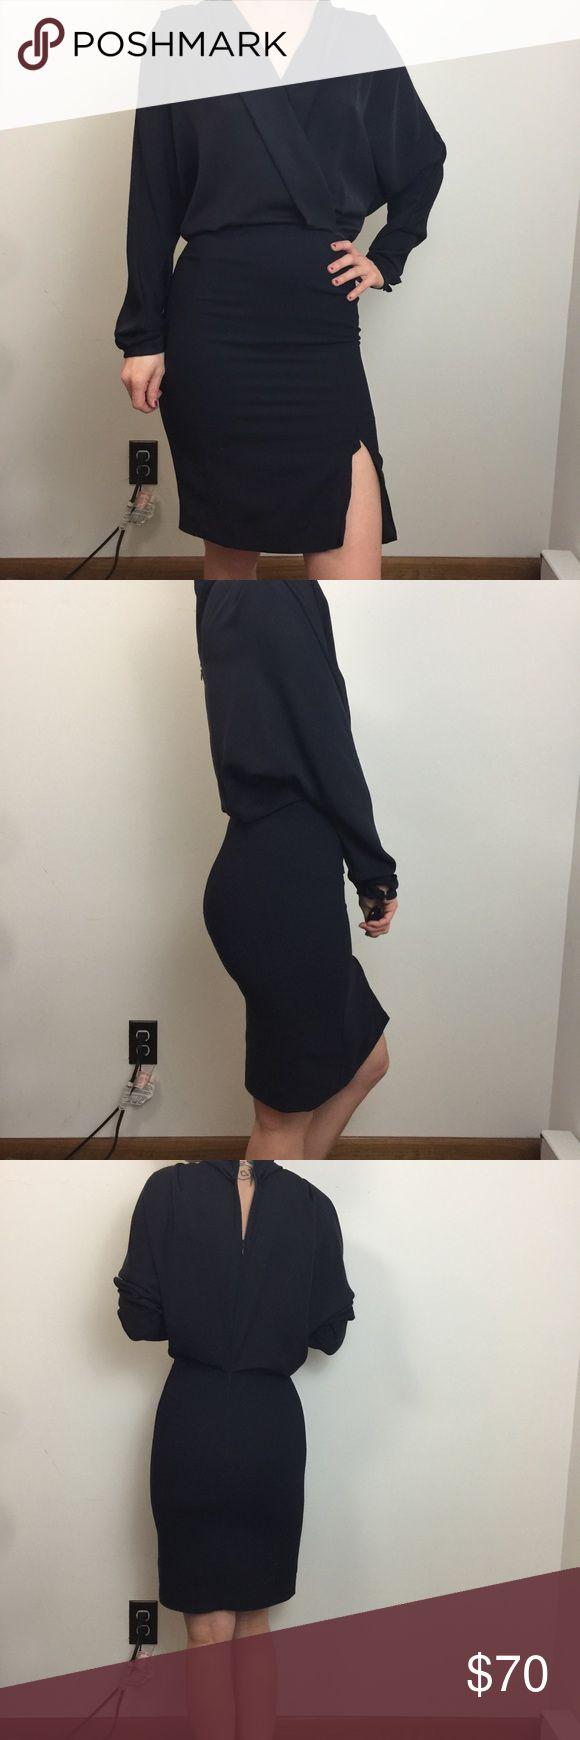 Reiss Dress Reiss Dress good condition and has a loose hem along th leg slit as shown. Repairable Reiss Dresses